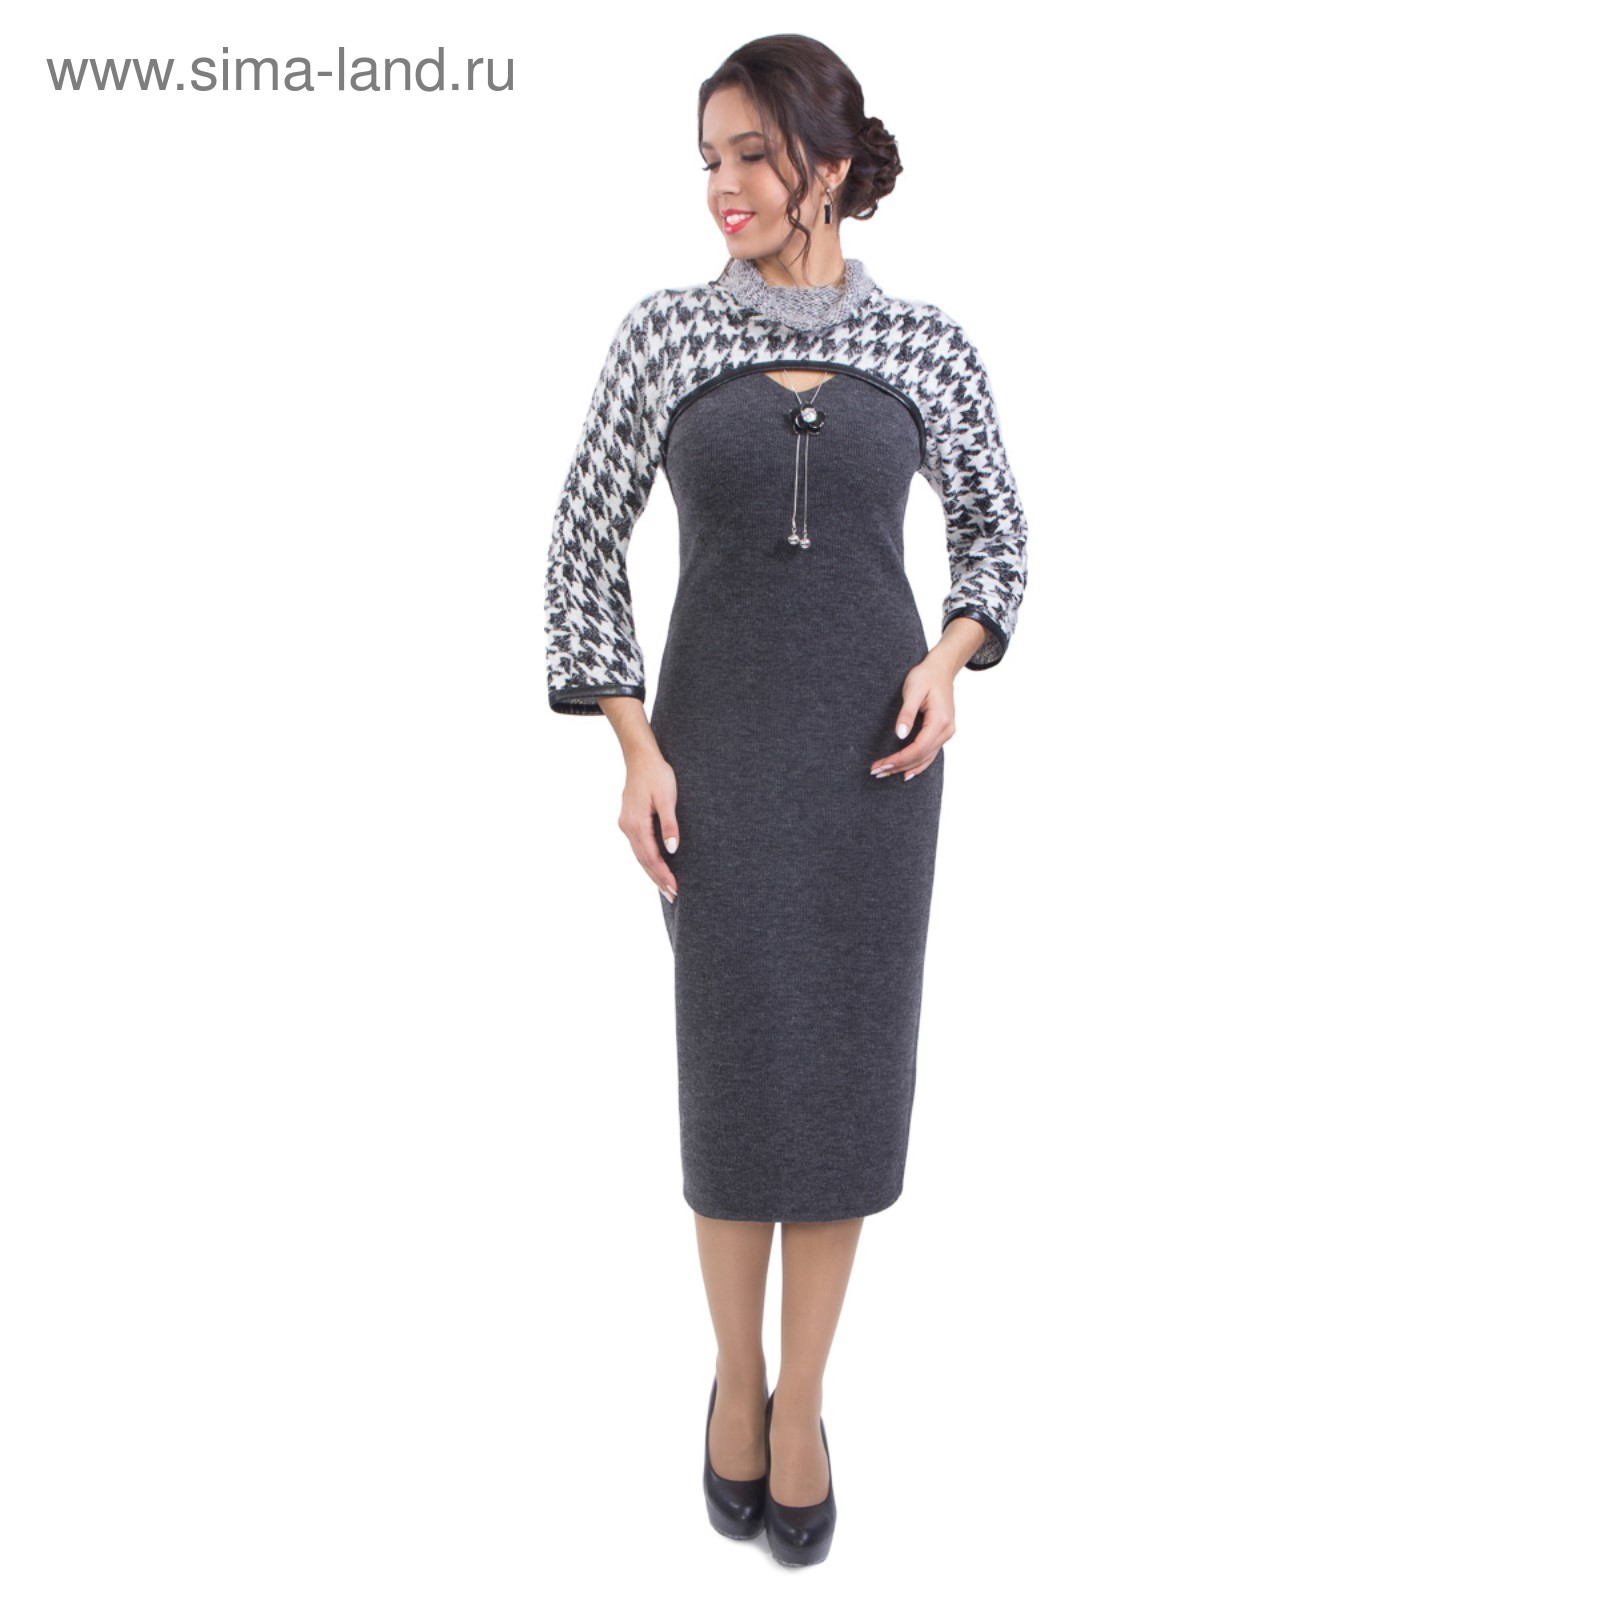 4a43c134110 Костюм женский (платье+жакет)